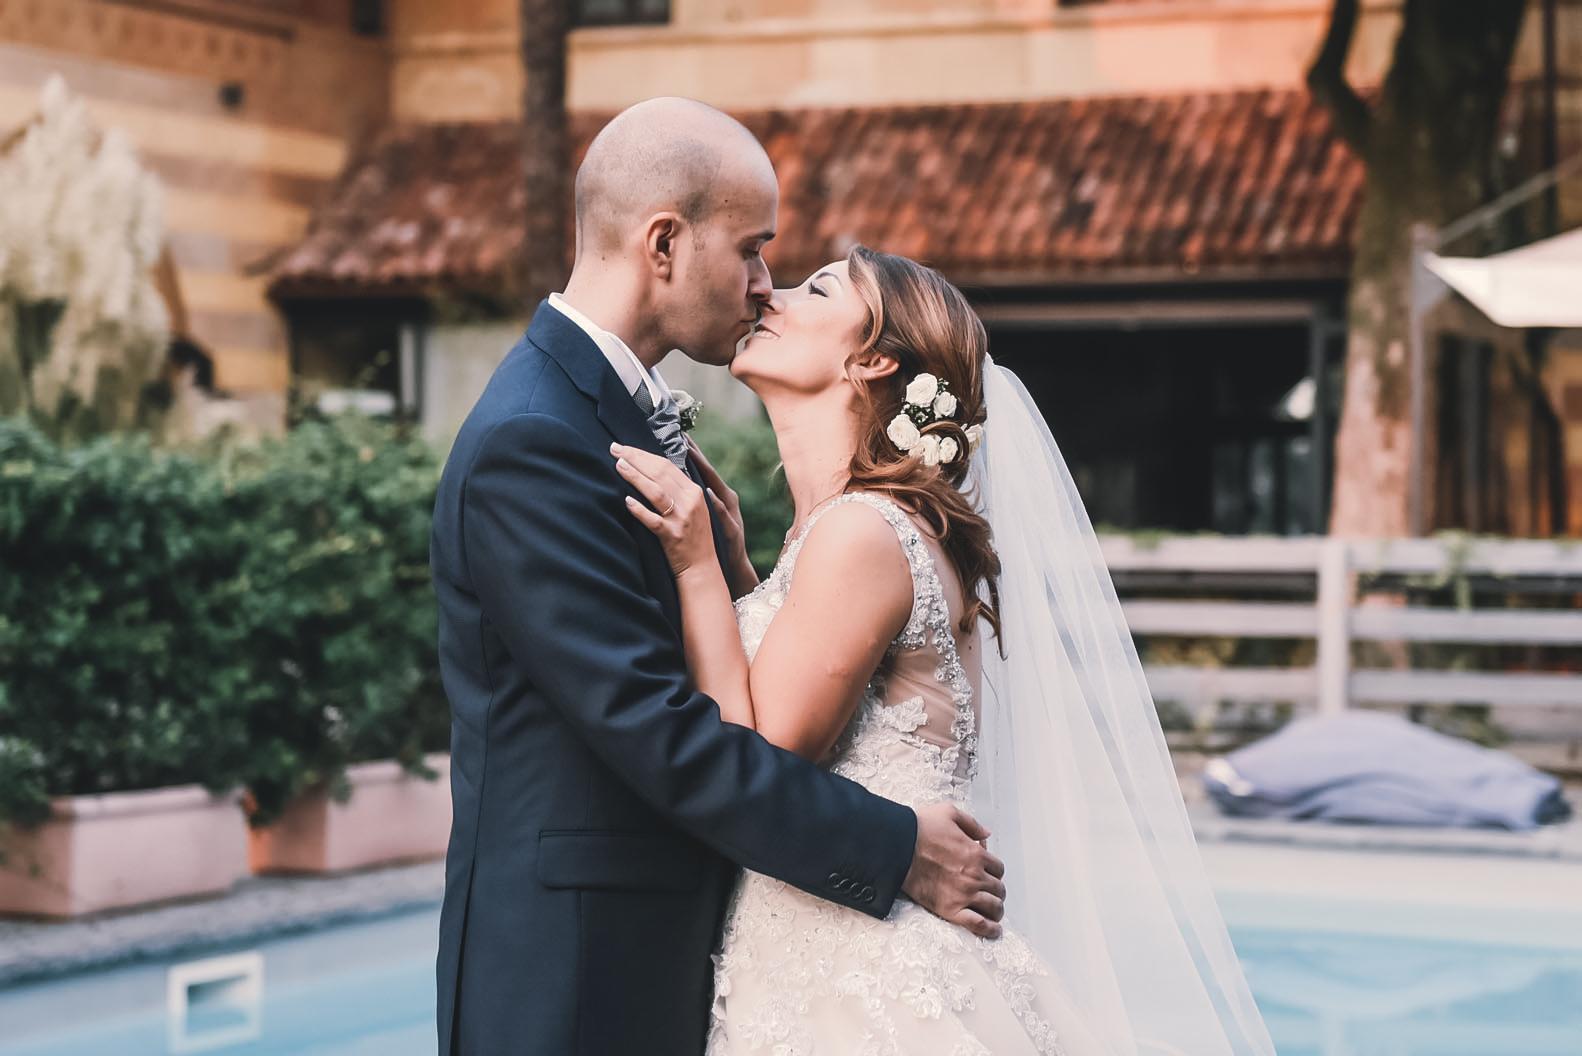 Foto matrimonio con piscina